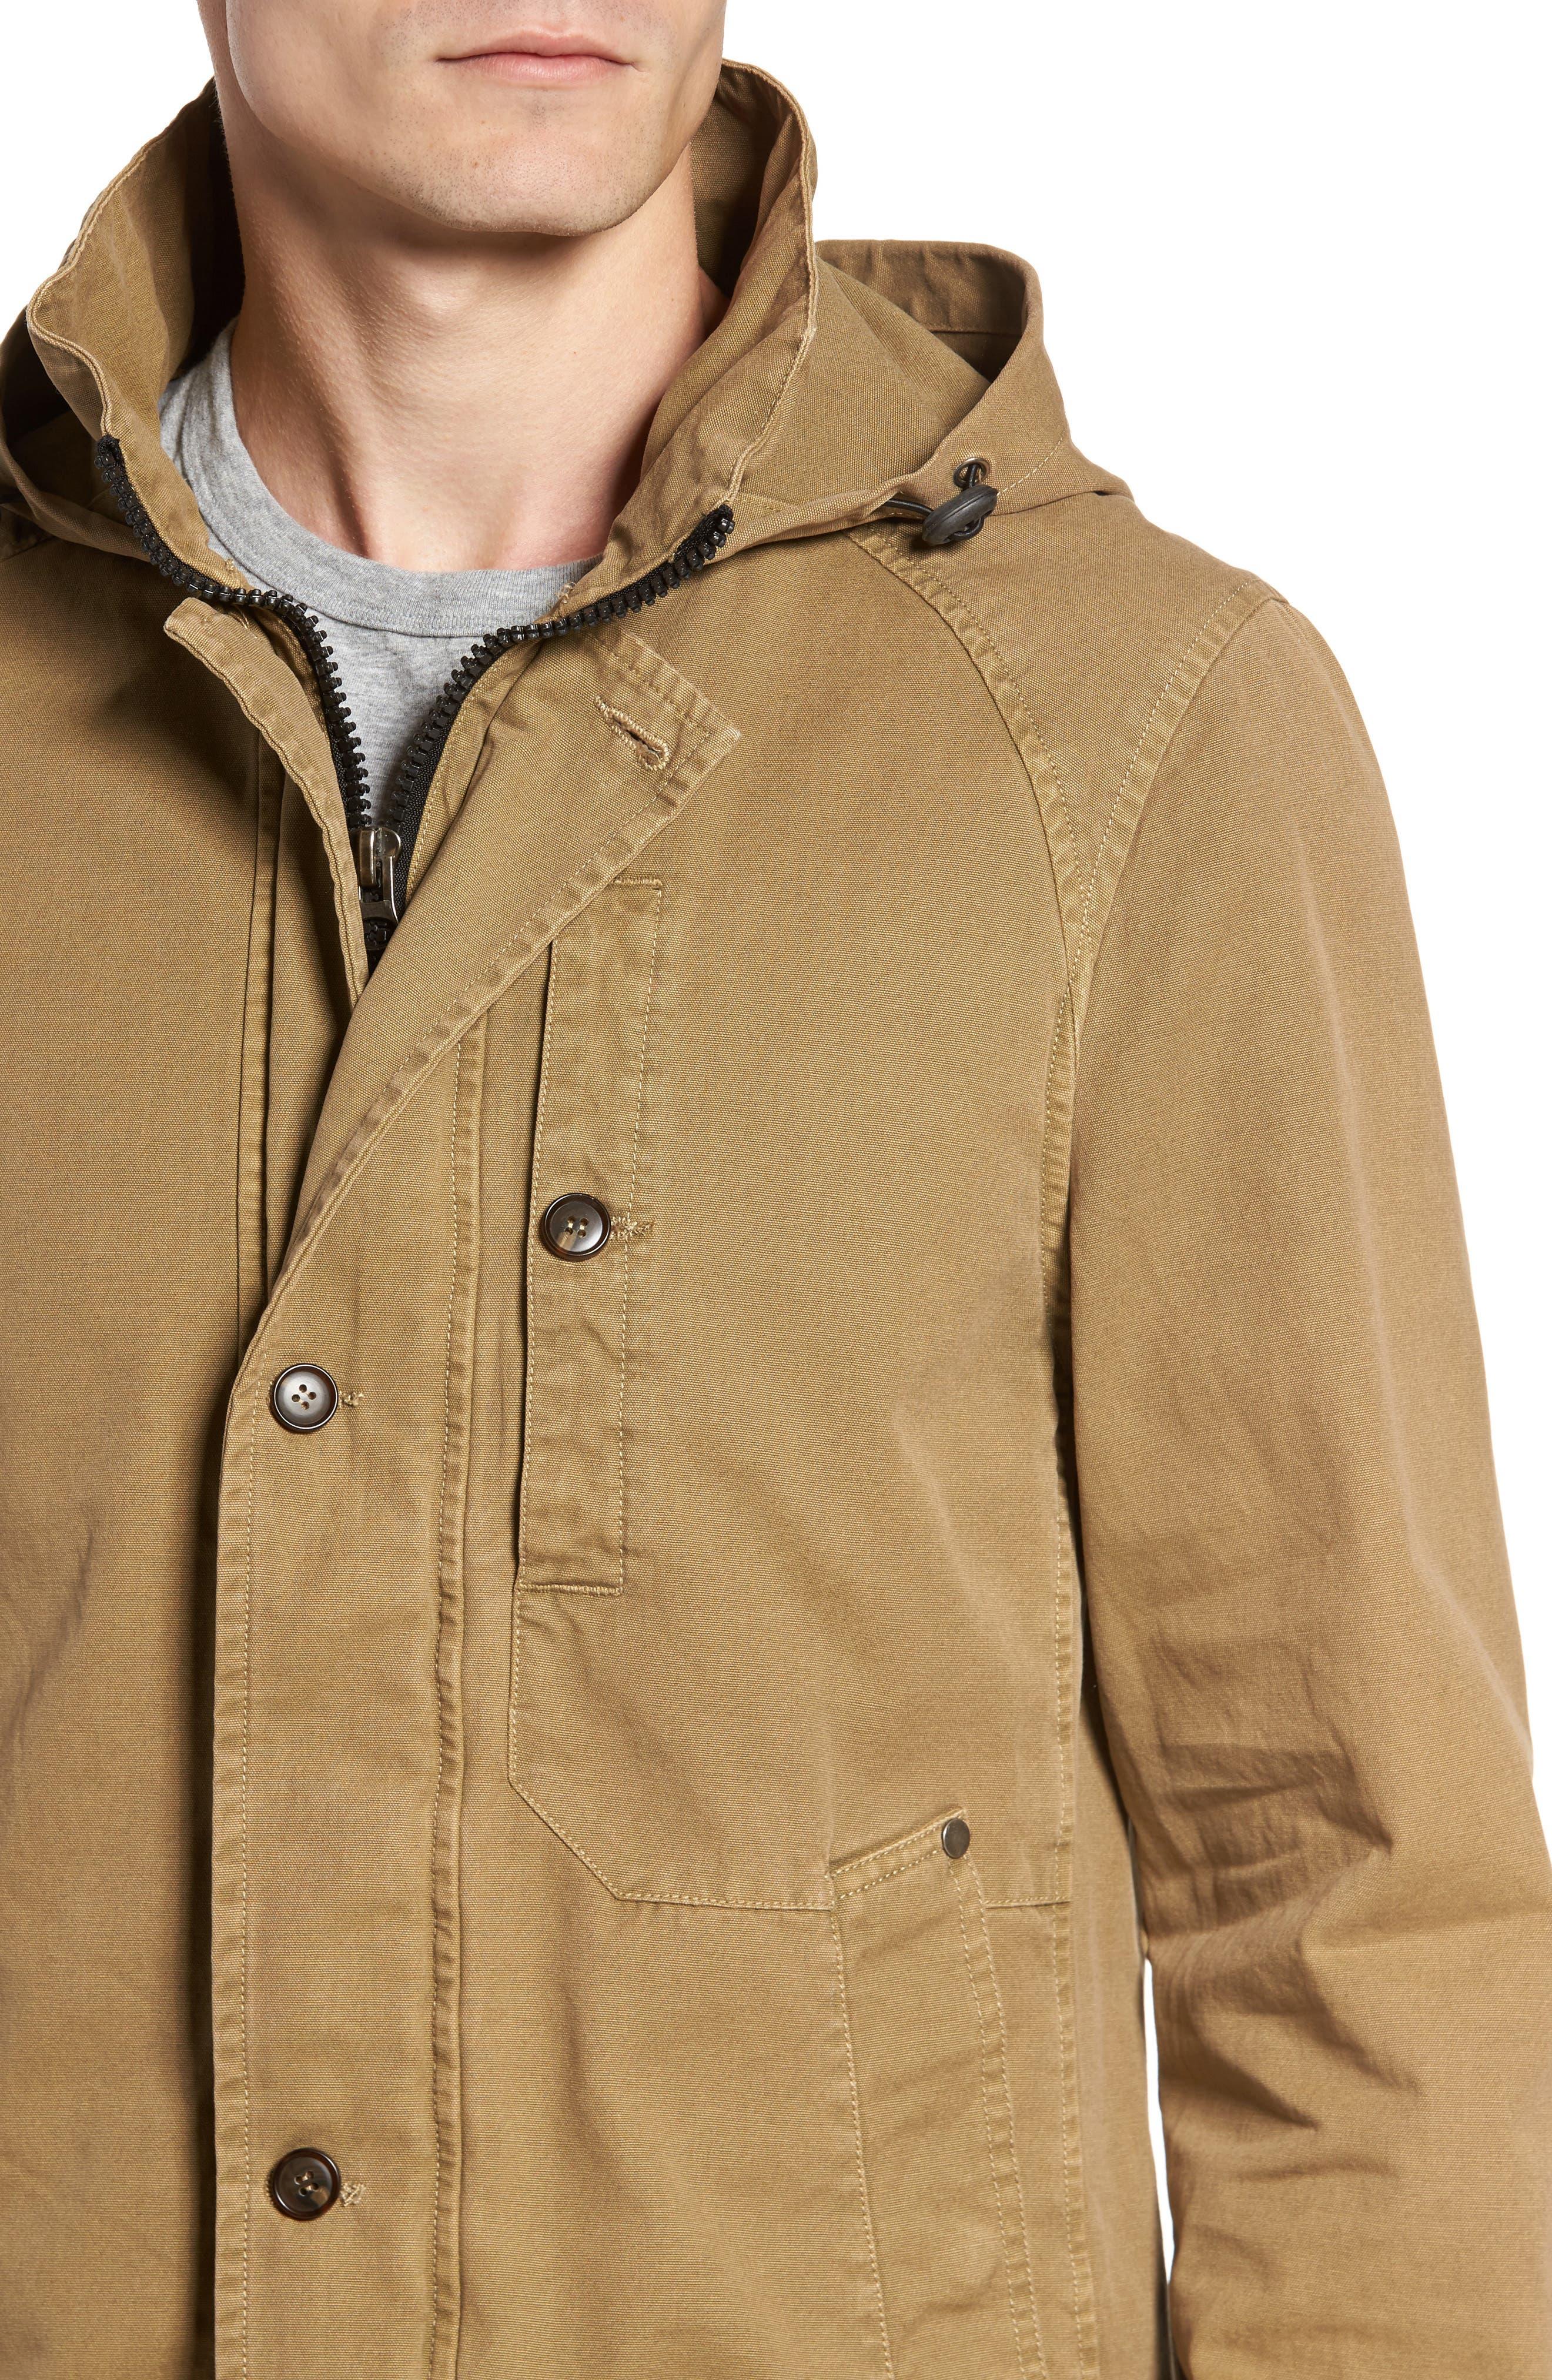 Herman Twill Hooded Jacket,                             Alternate thumbnail 4, color,                             250